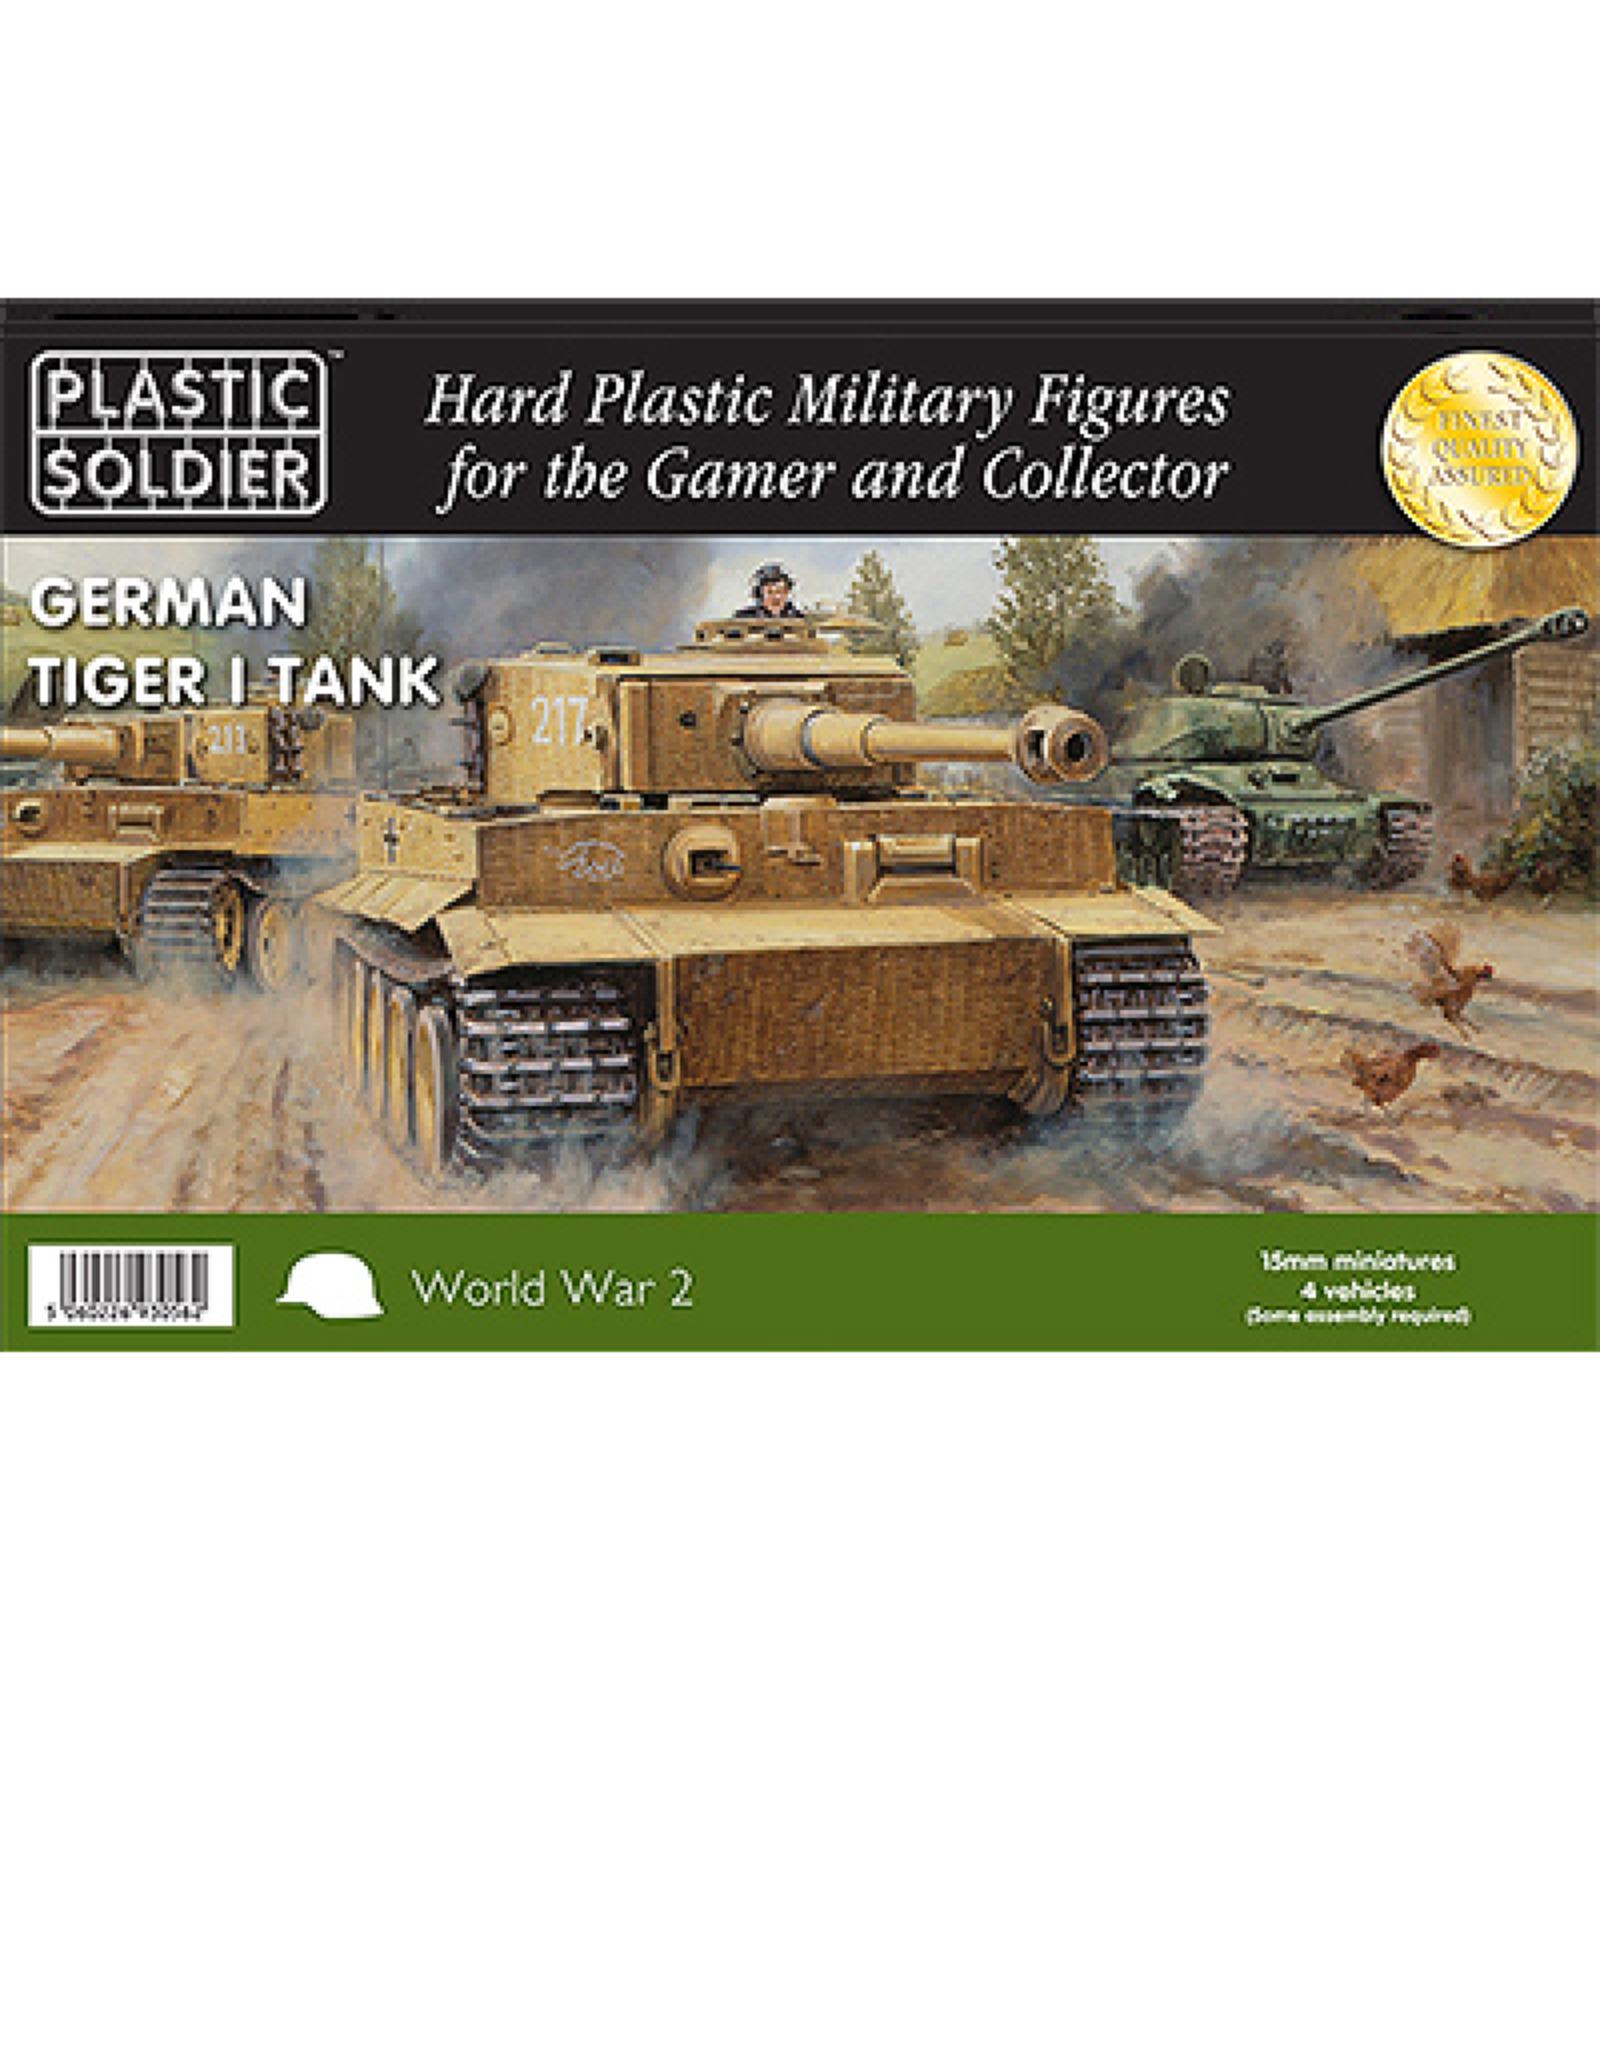 Plastic Soldier Company German Tiger I Tank